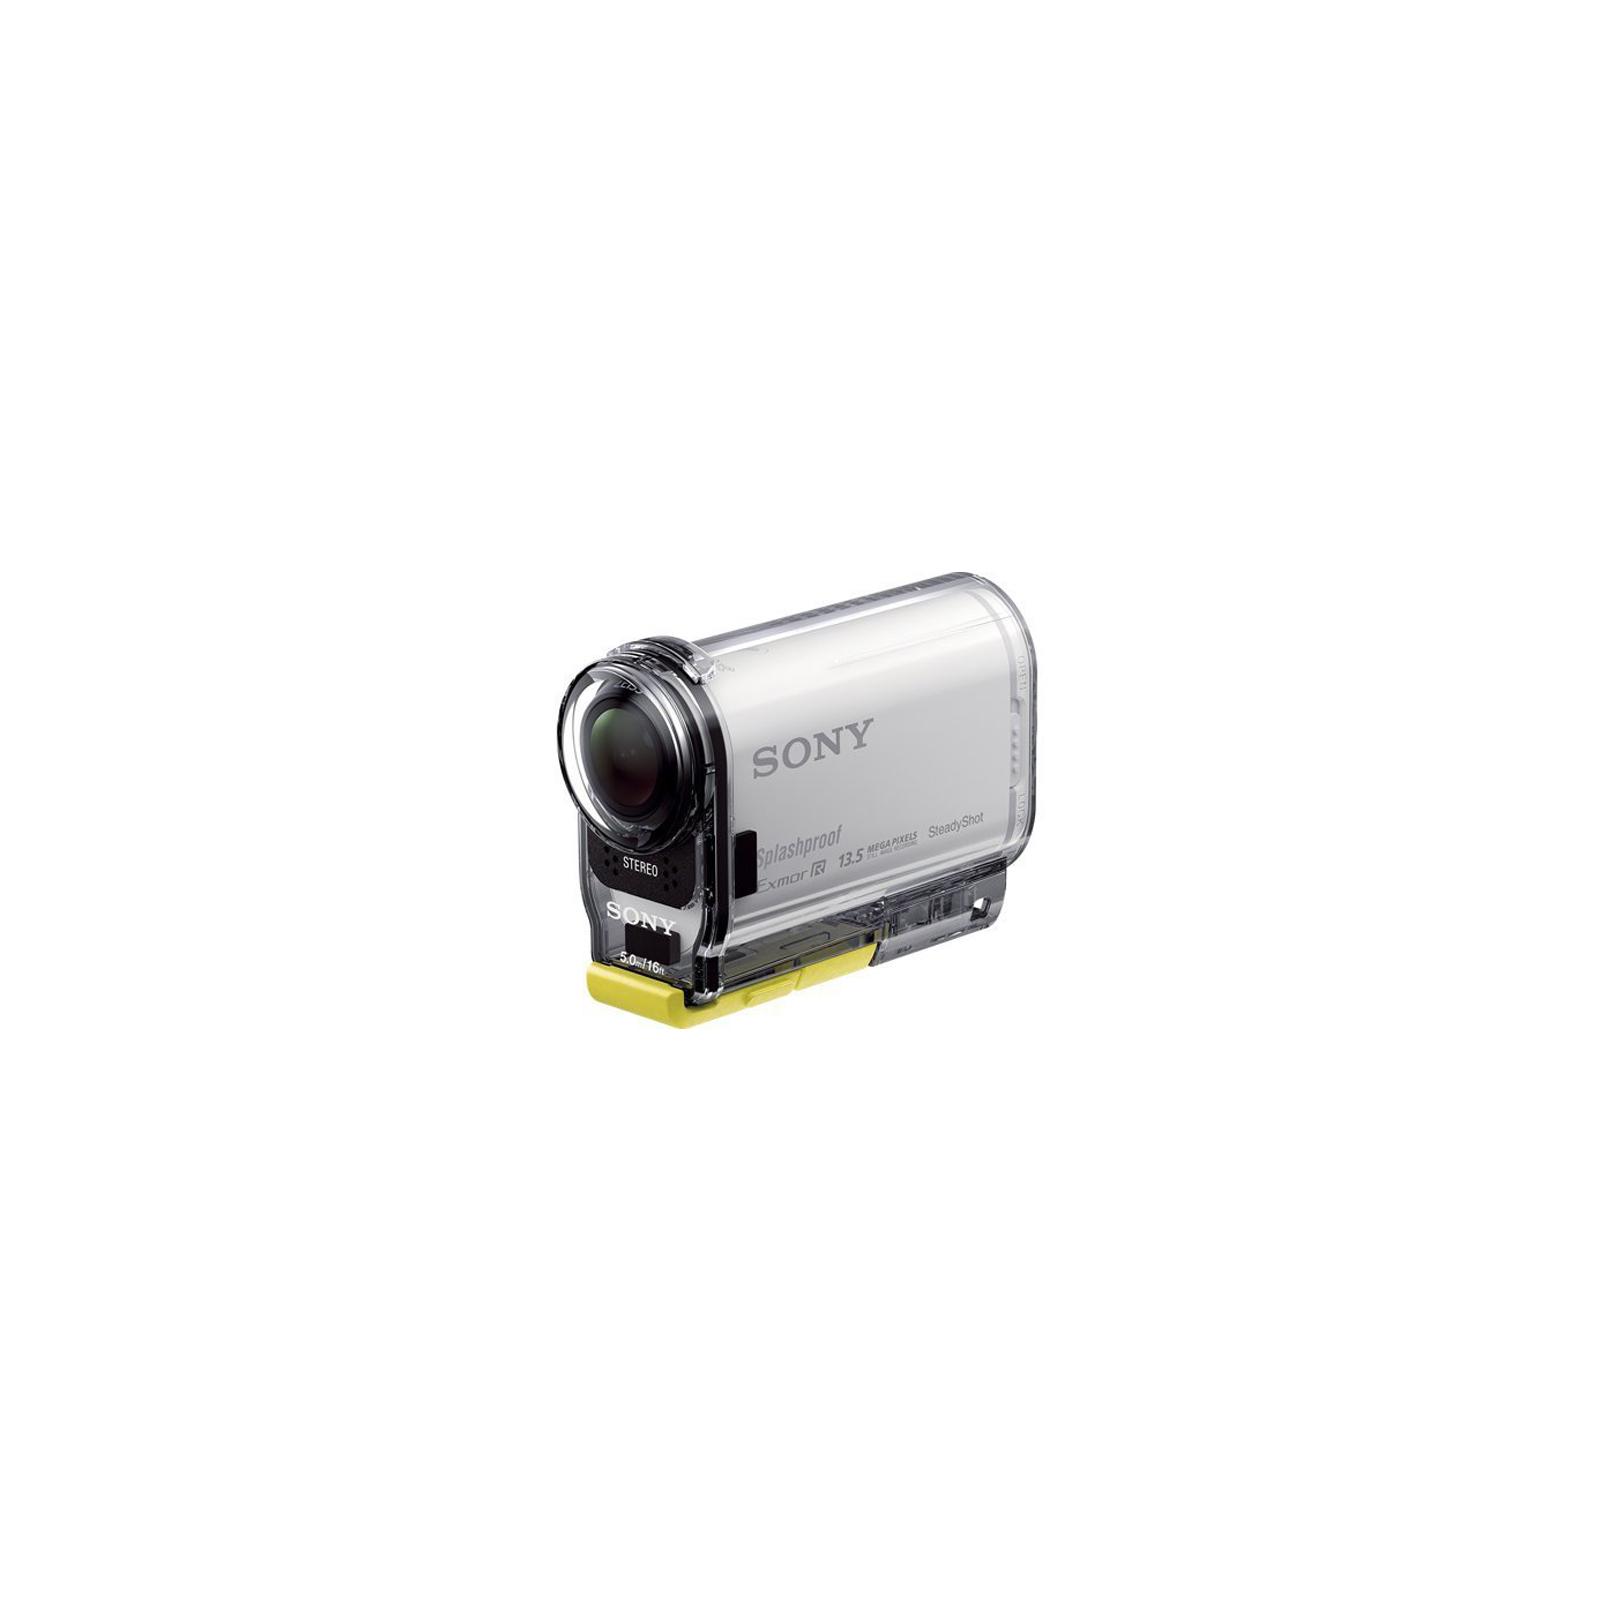 Экшн-камера SONY HDR-AS100V w/bicycle mount (HDRAS100VB.CEN) изображение 2